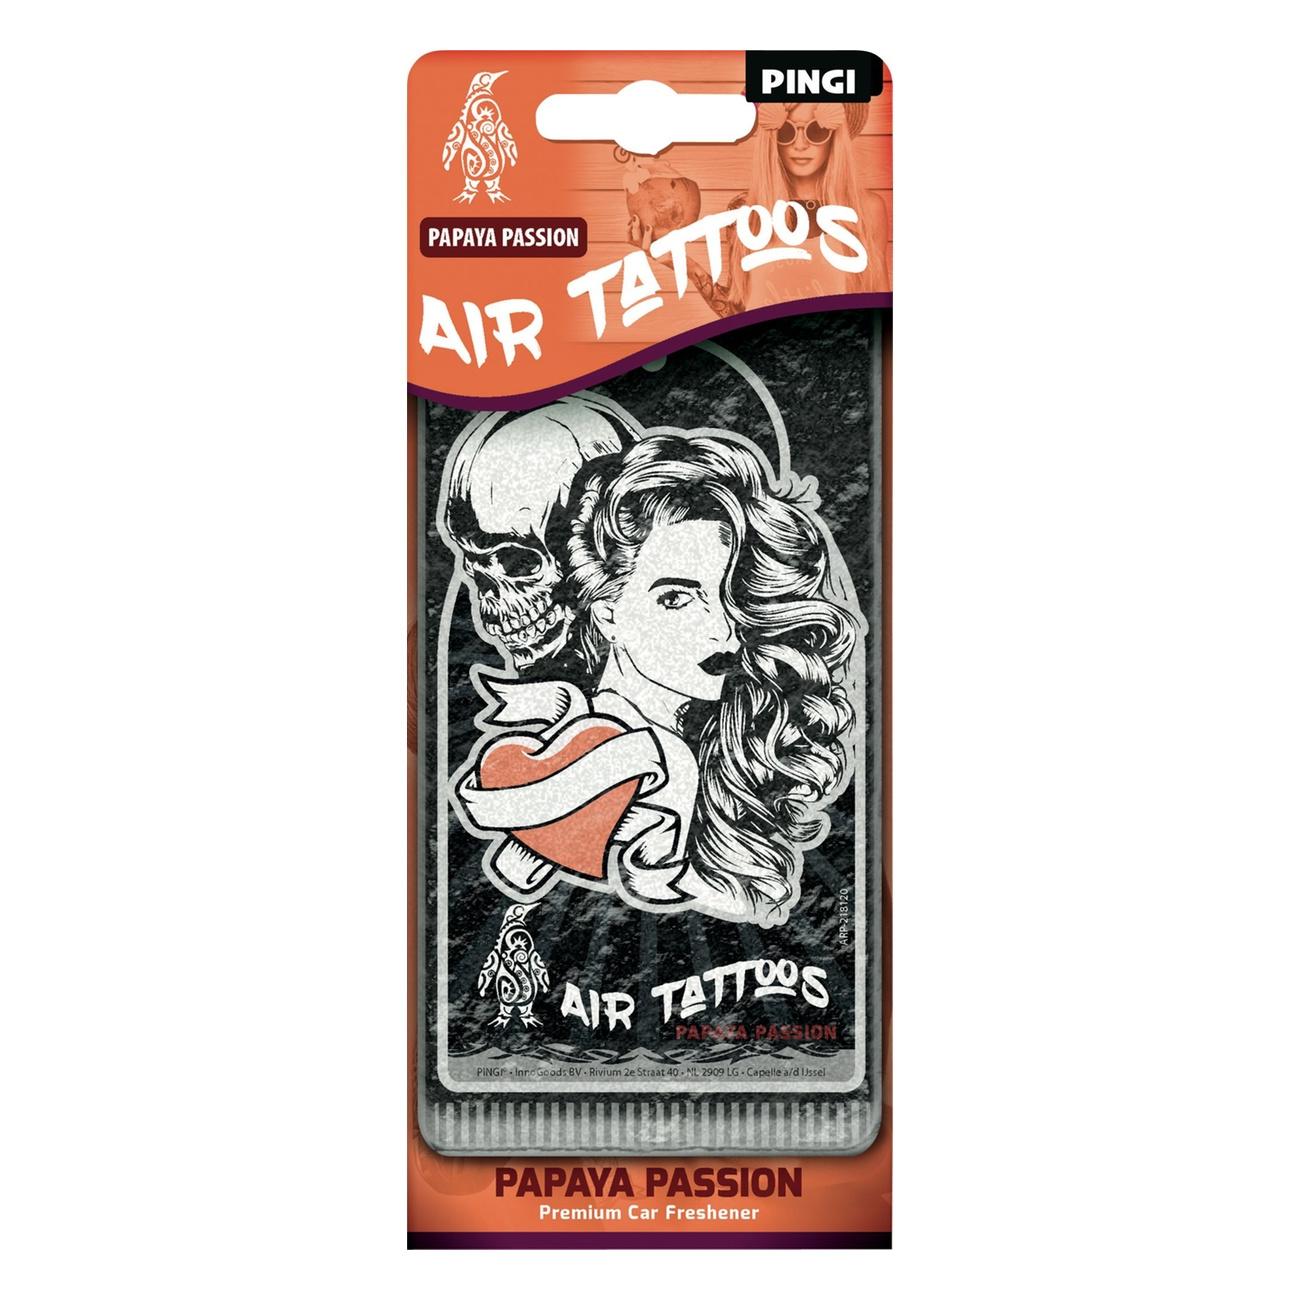 PINGI Air Tattoos, Papaya Passion